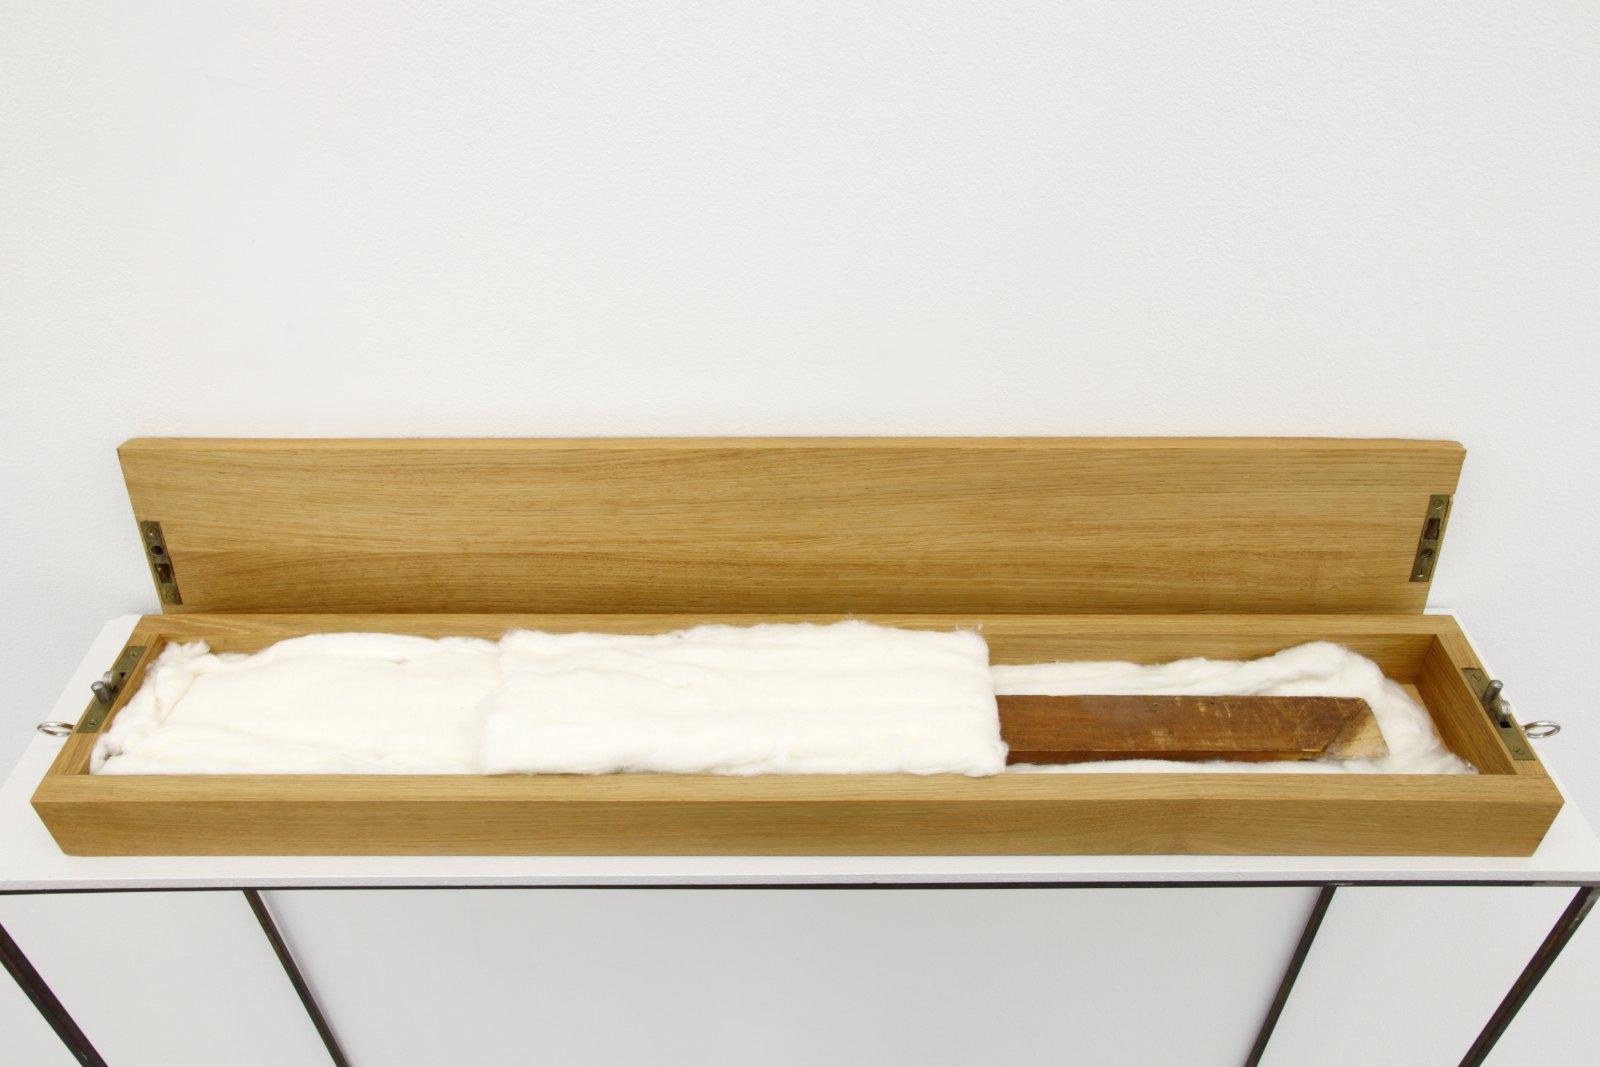 Georg Herold, Latte in Watte, 1979/1989, Cotton, wood, 100 x 8 x 12 cm